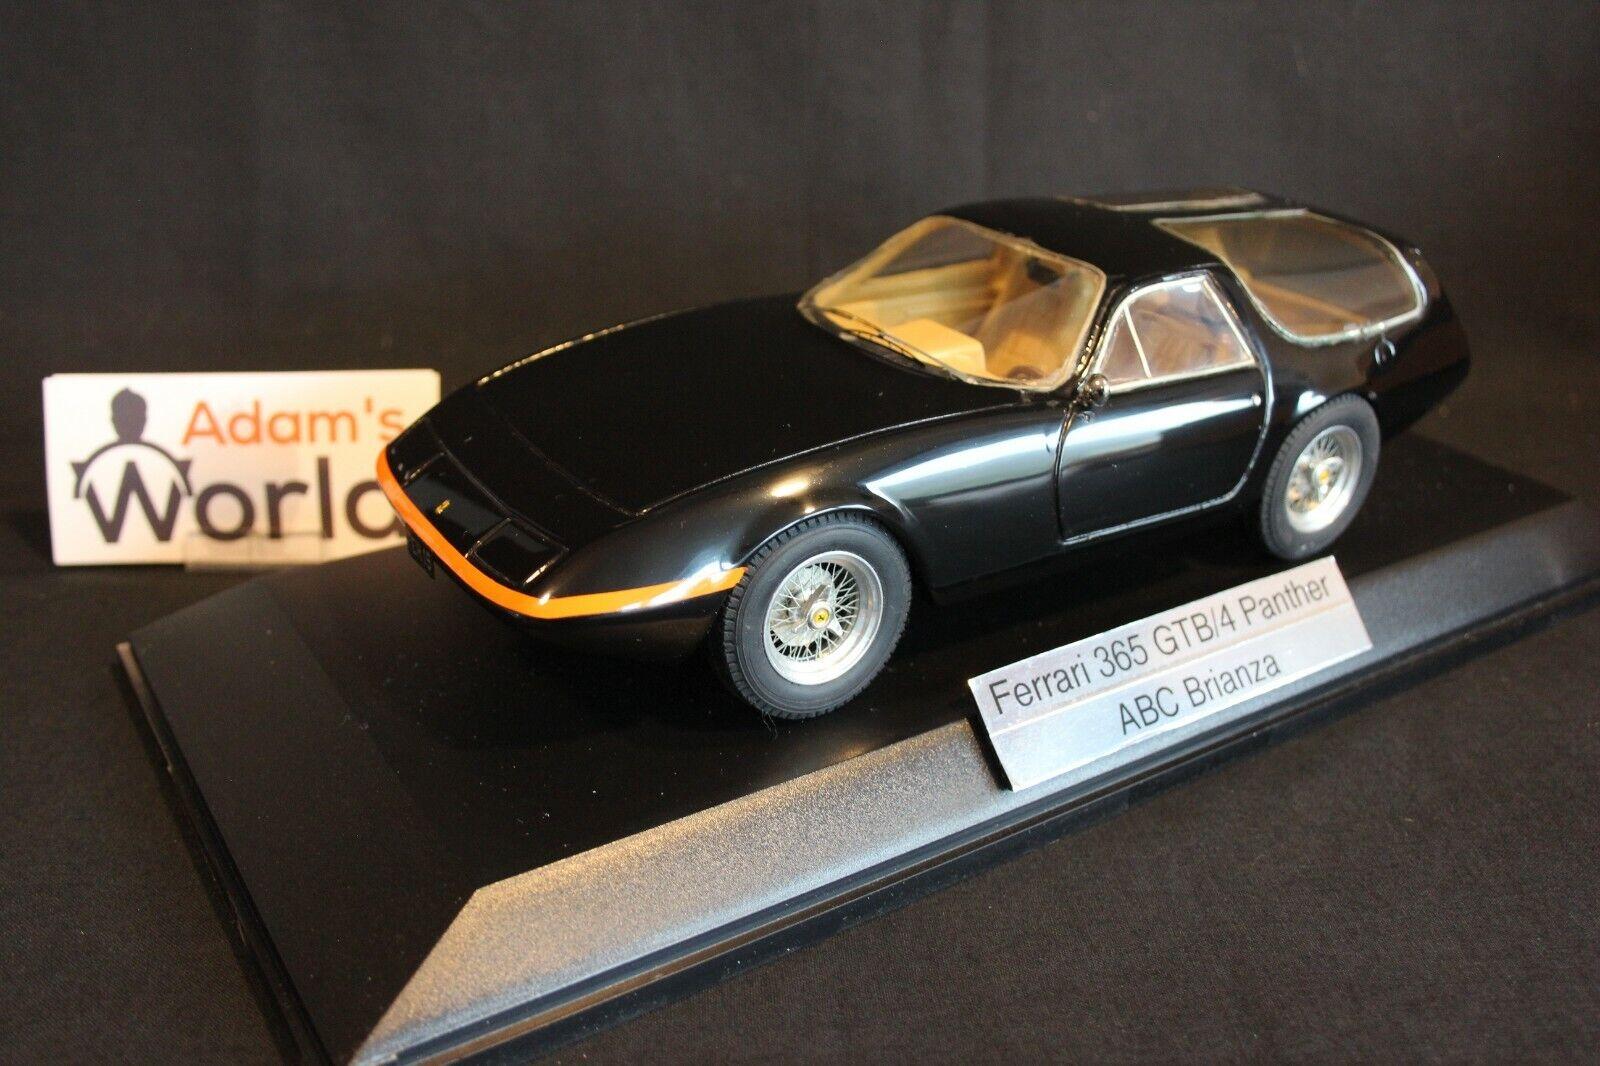 ABC Brianza built kit Ferrari 365 GTB 4 Panther 1 18 negro (PJBB)